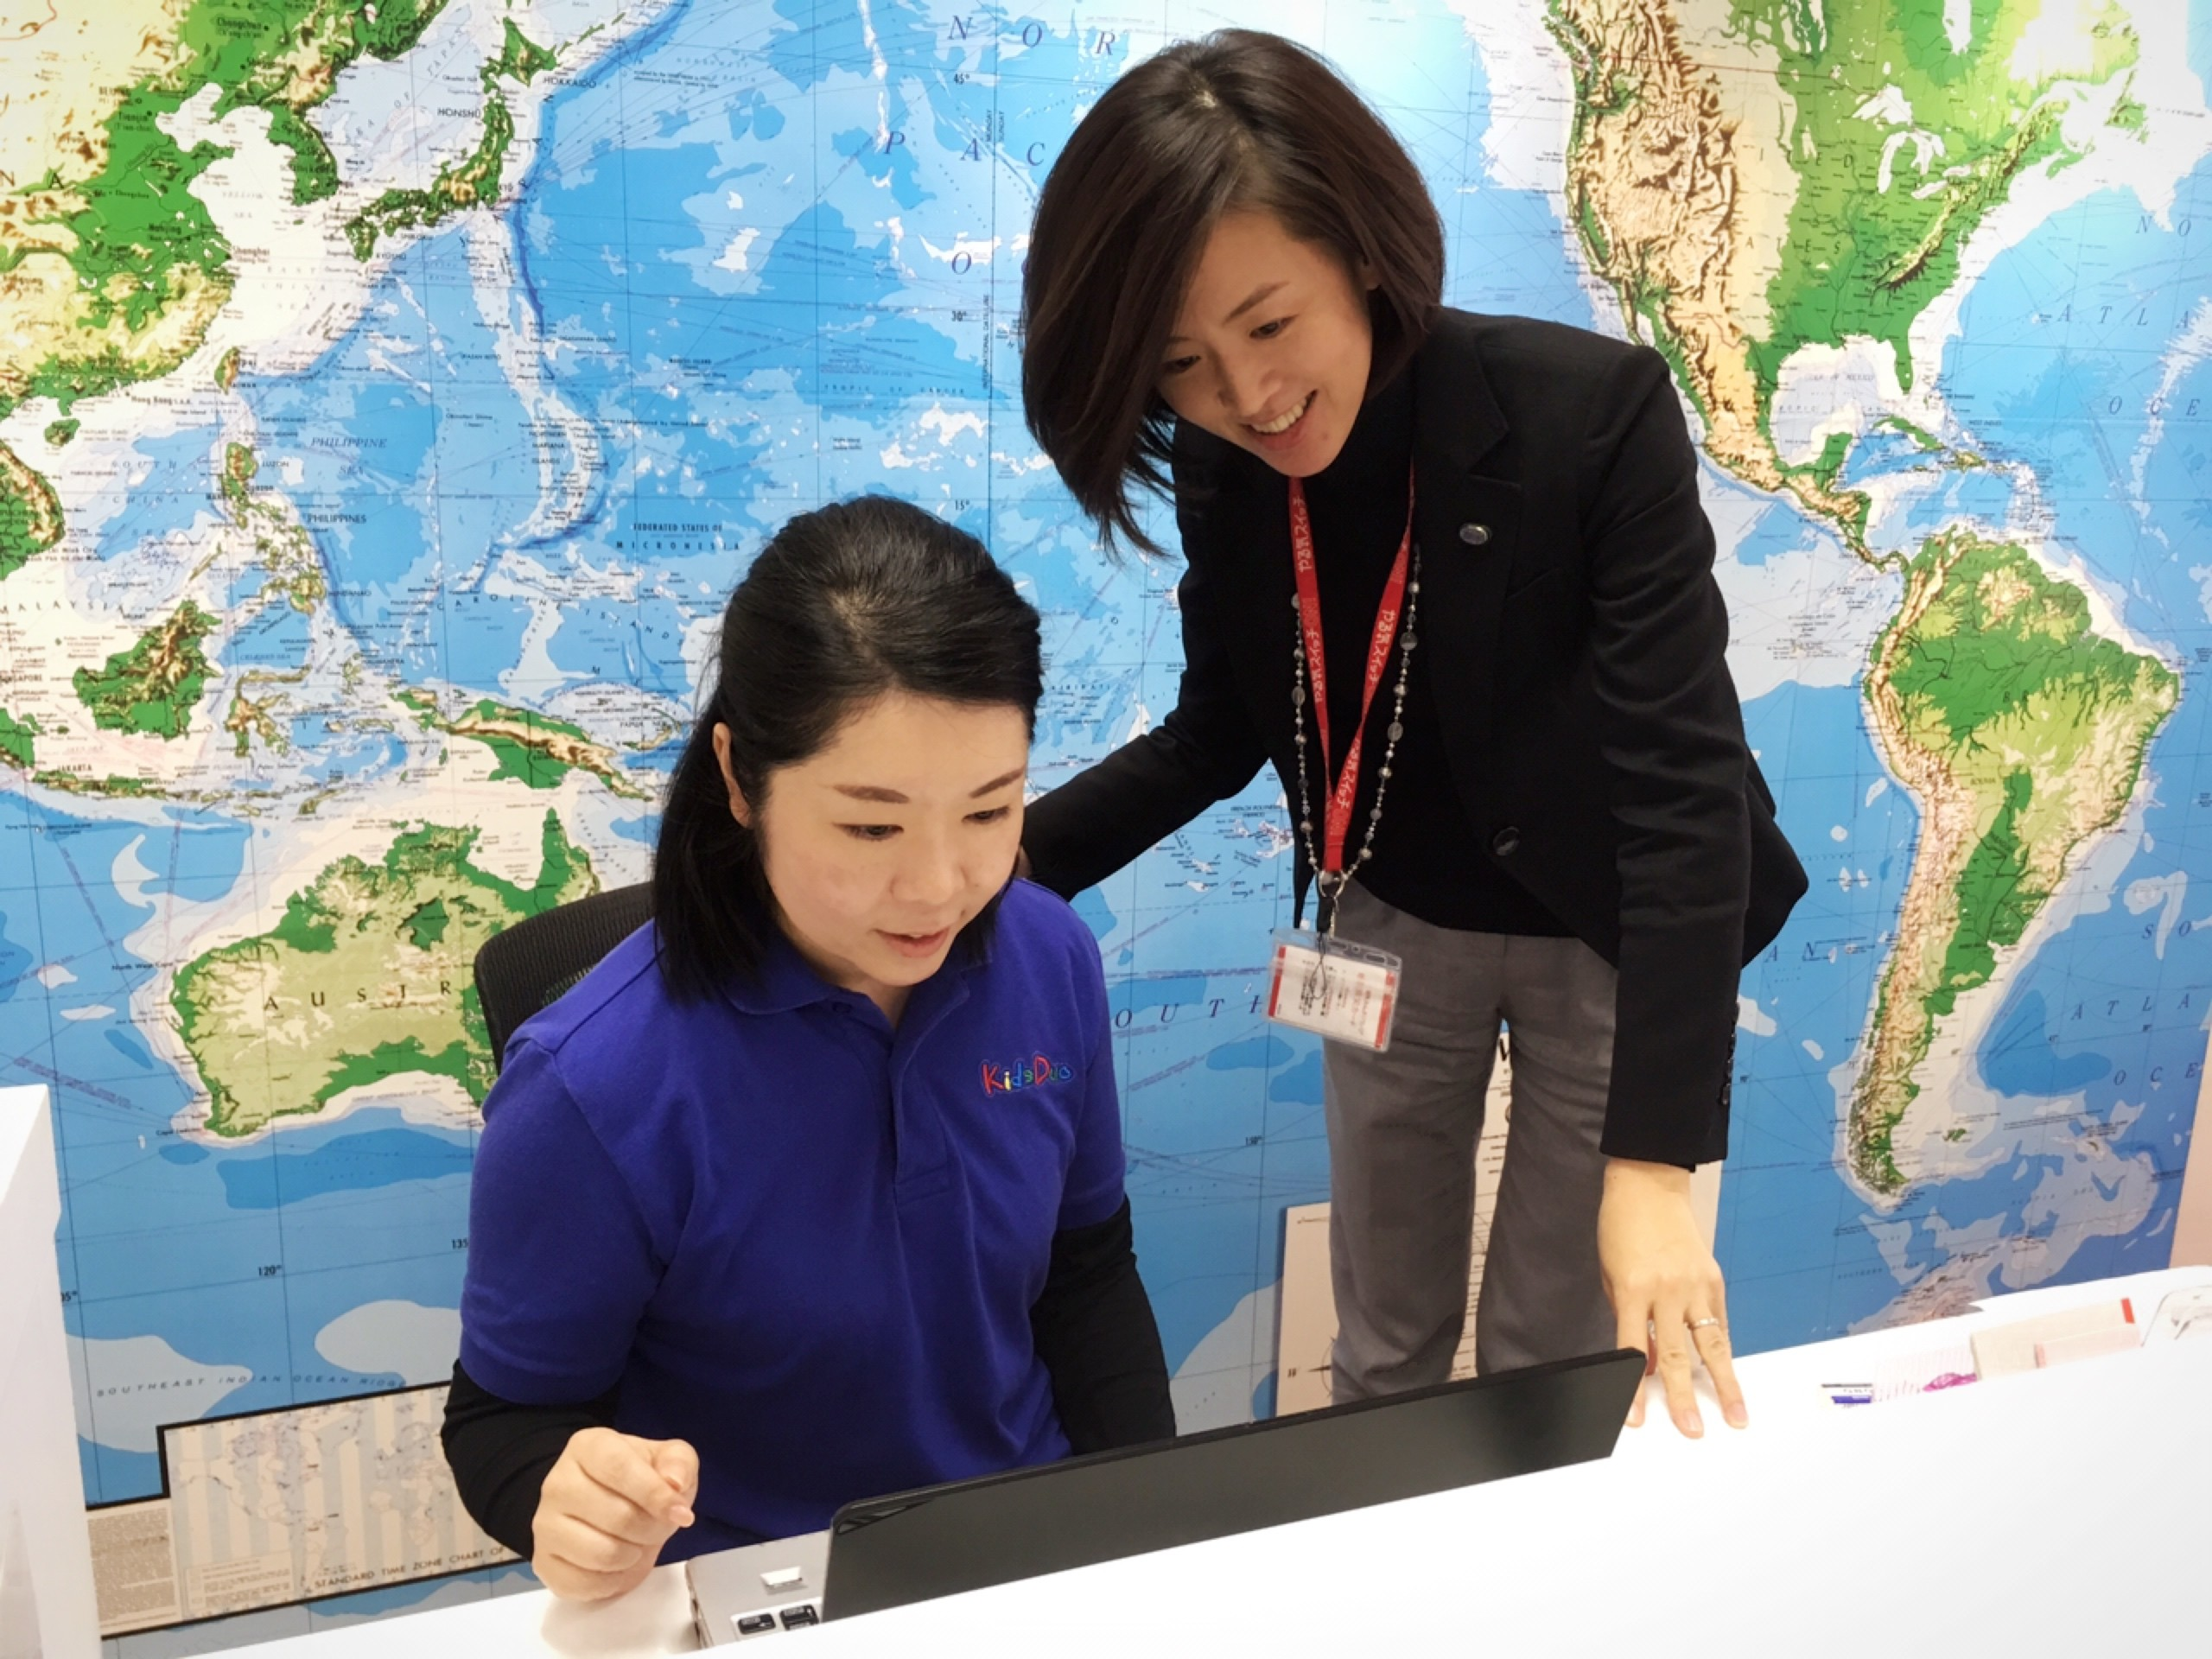 Kids Duo(キッズデュオ) 玉川 スクールクラークのアルバイト情報